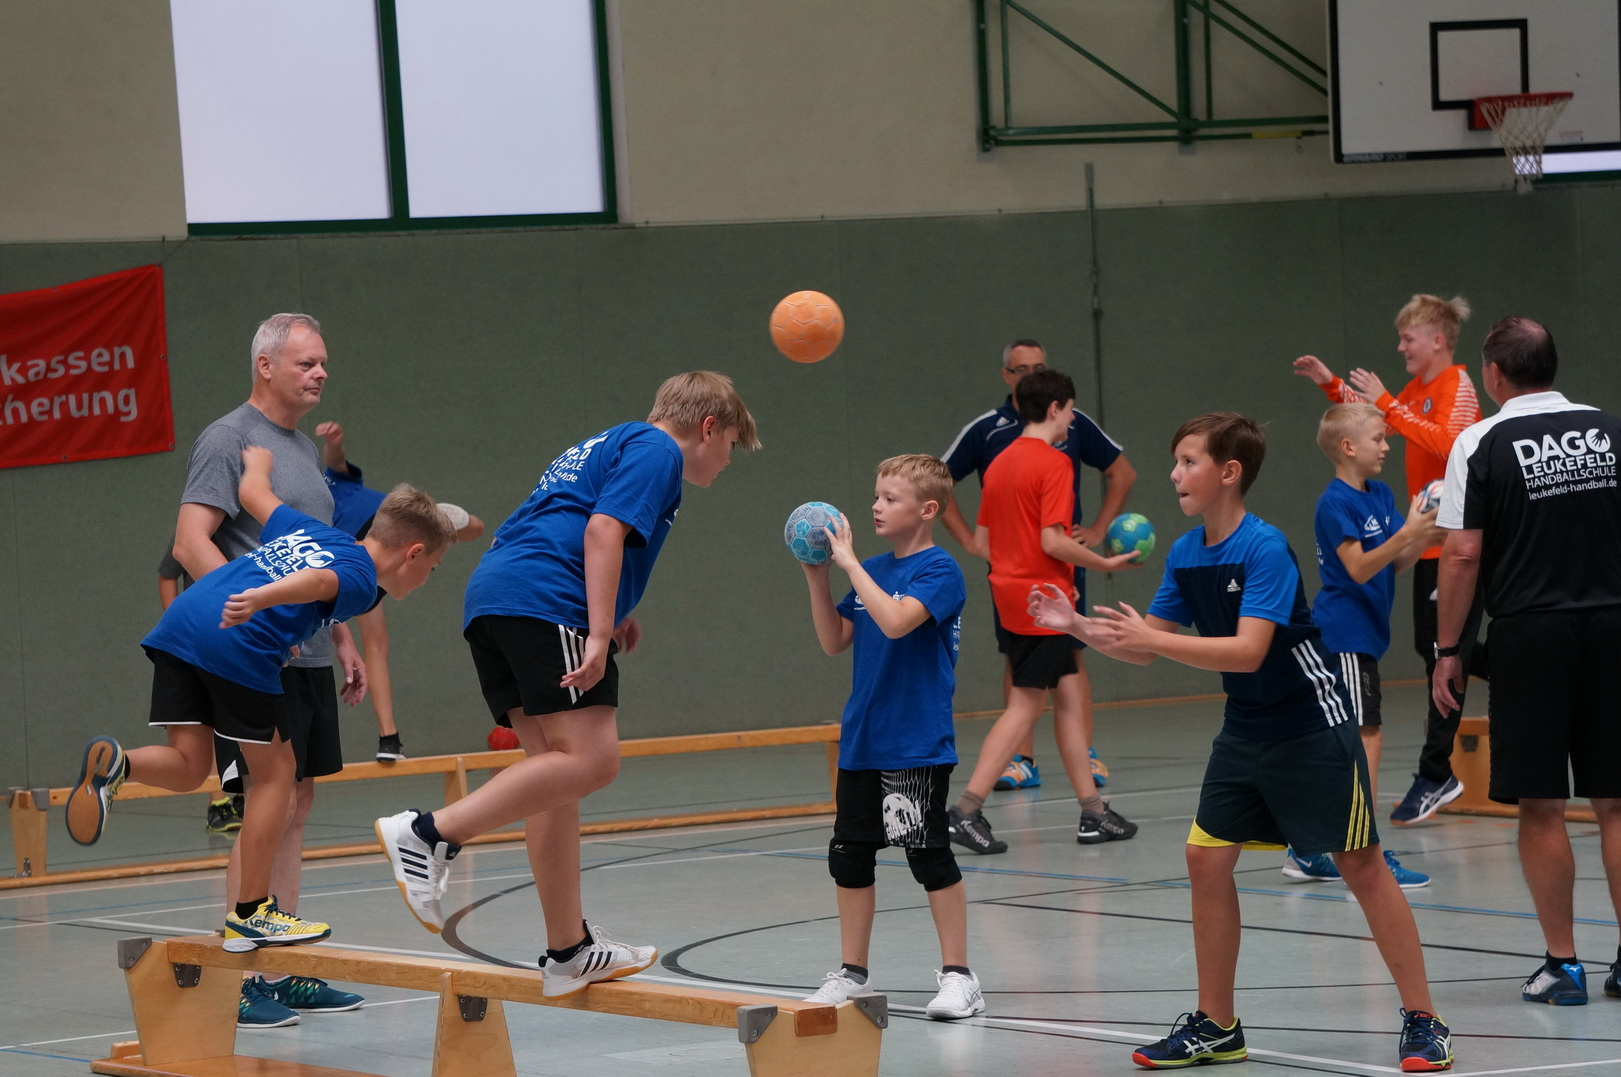 201808_Handballcamp_SDH_MG_183w